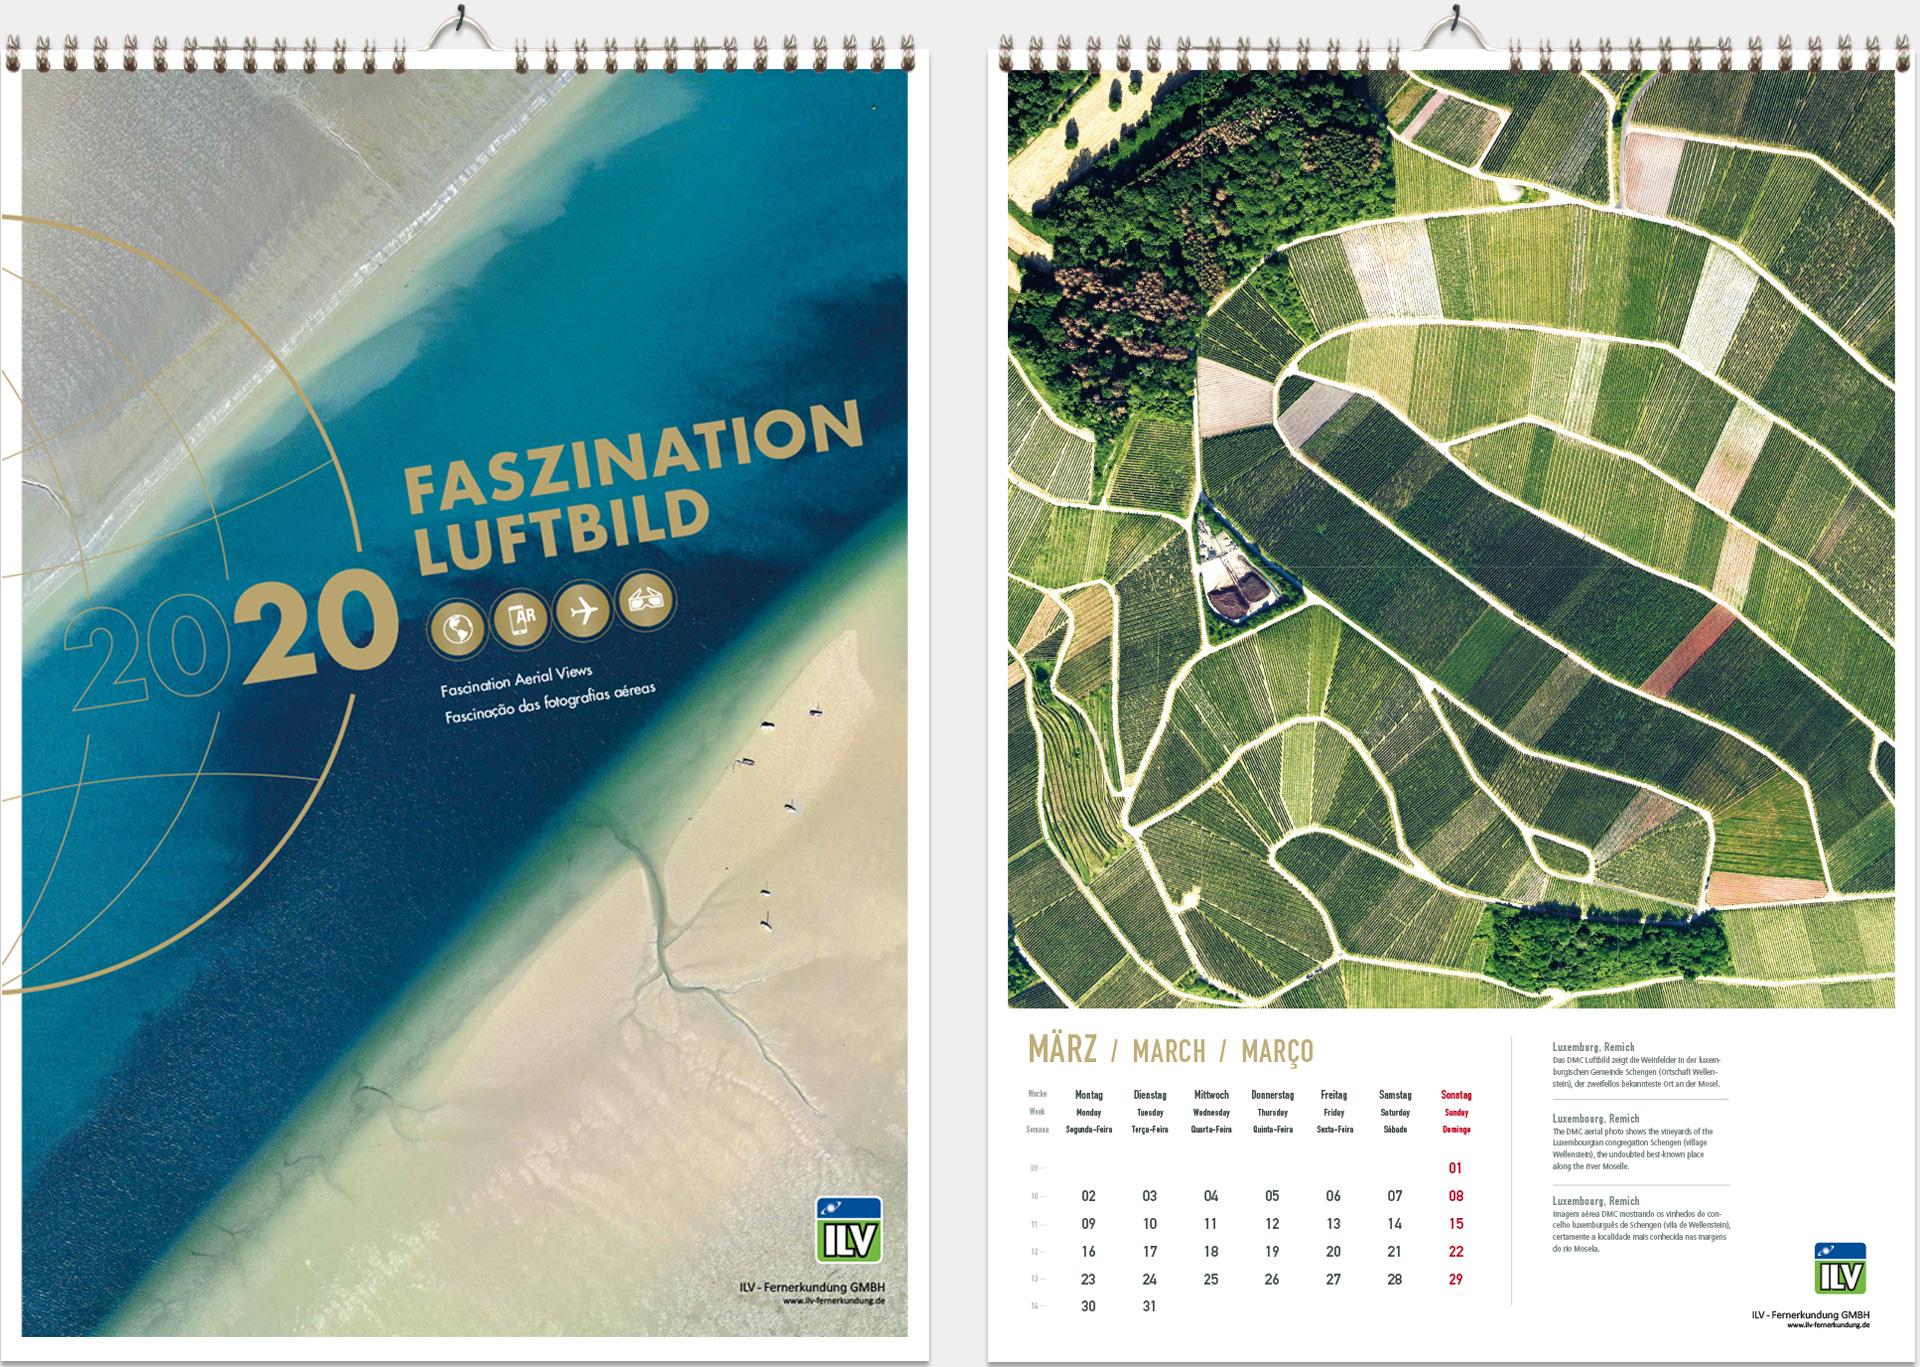 Referenz agreement - ILV-Kalender 2020